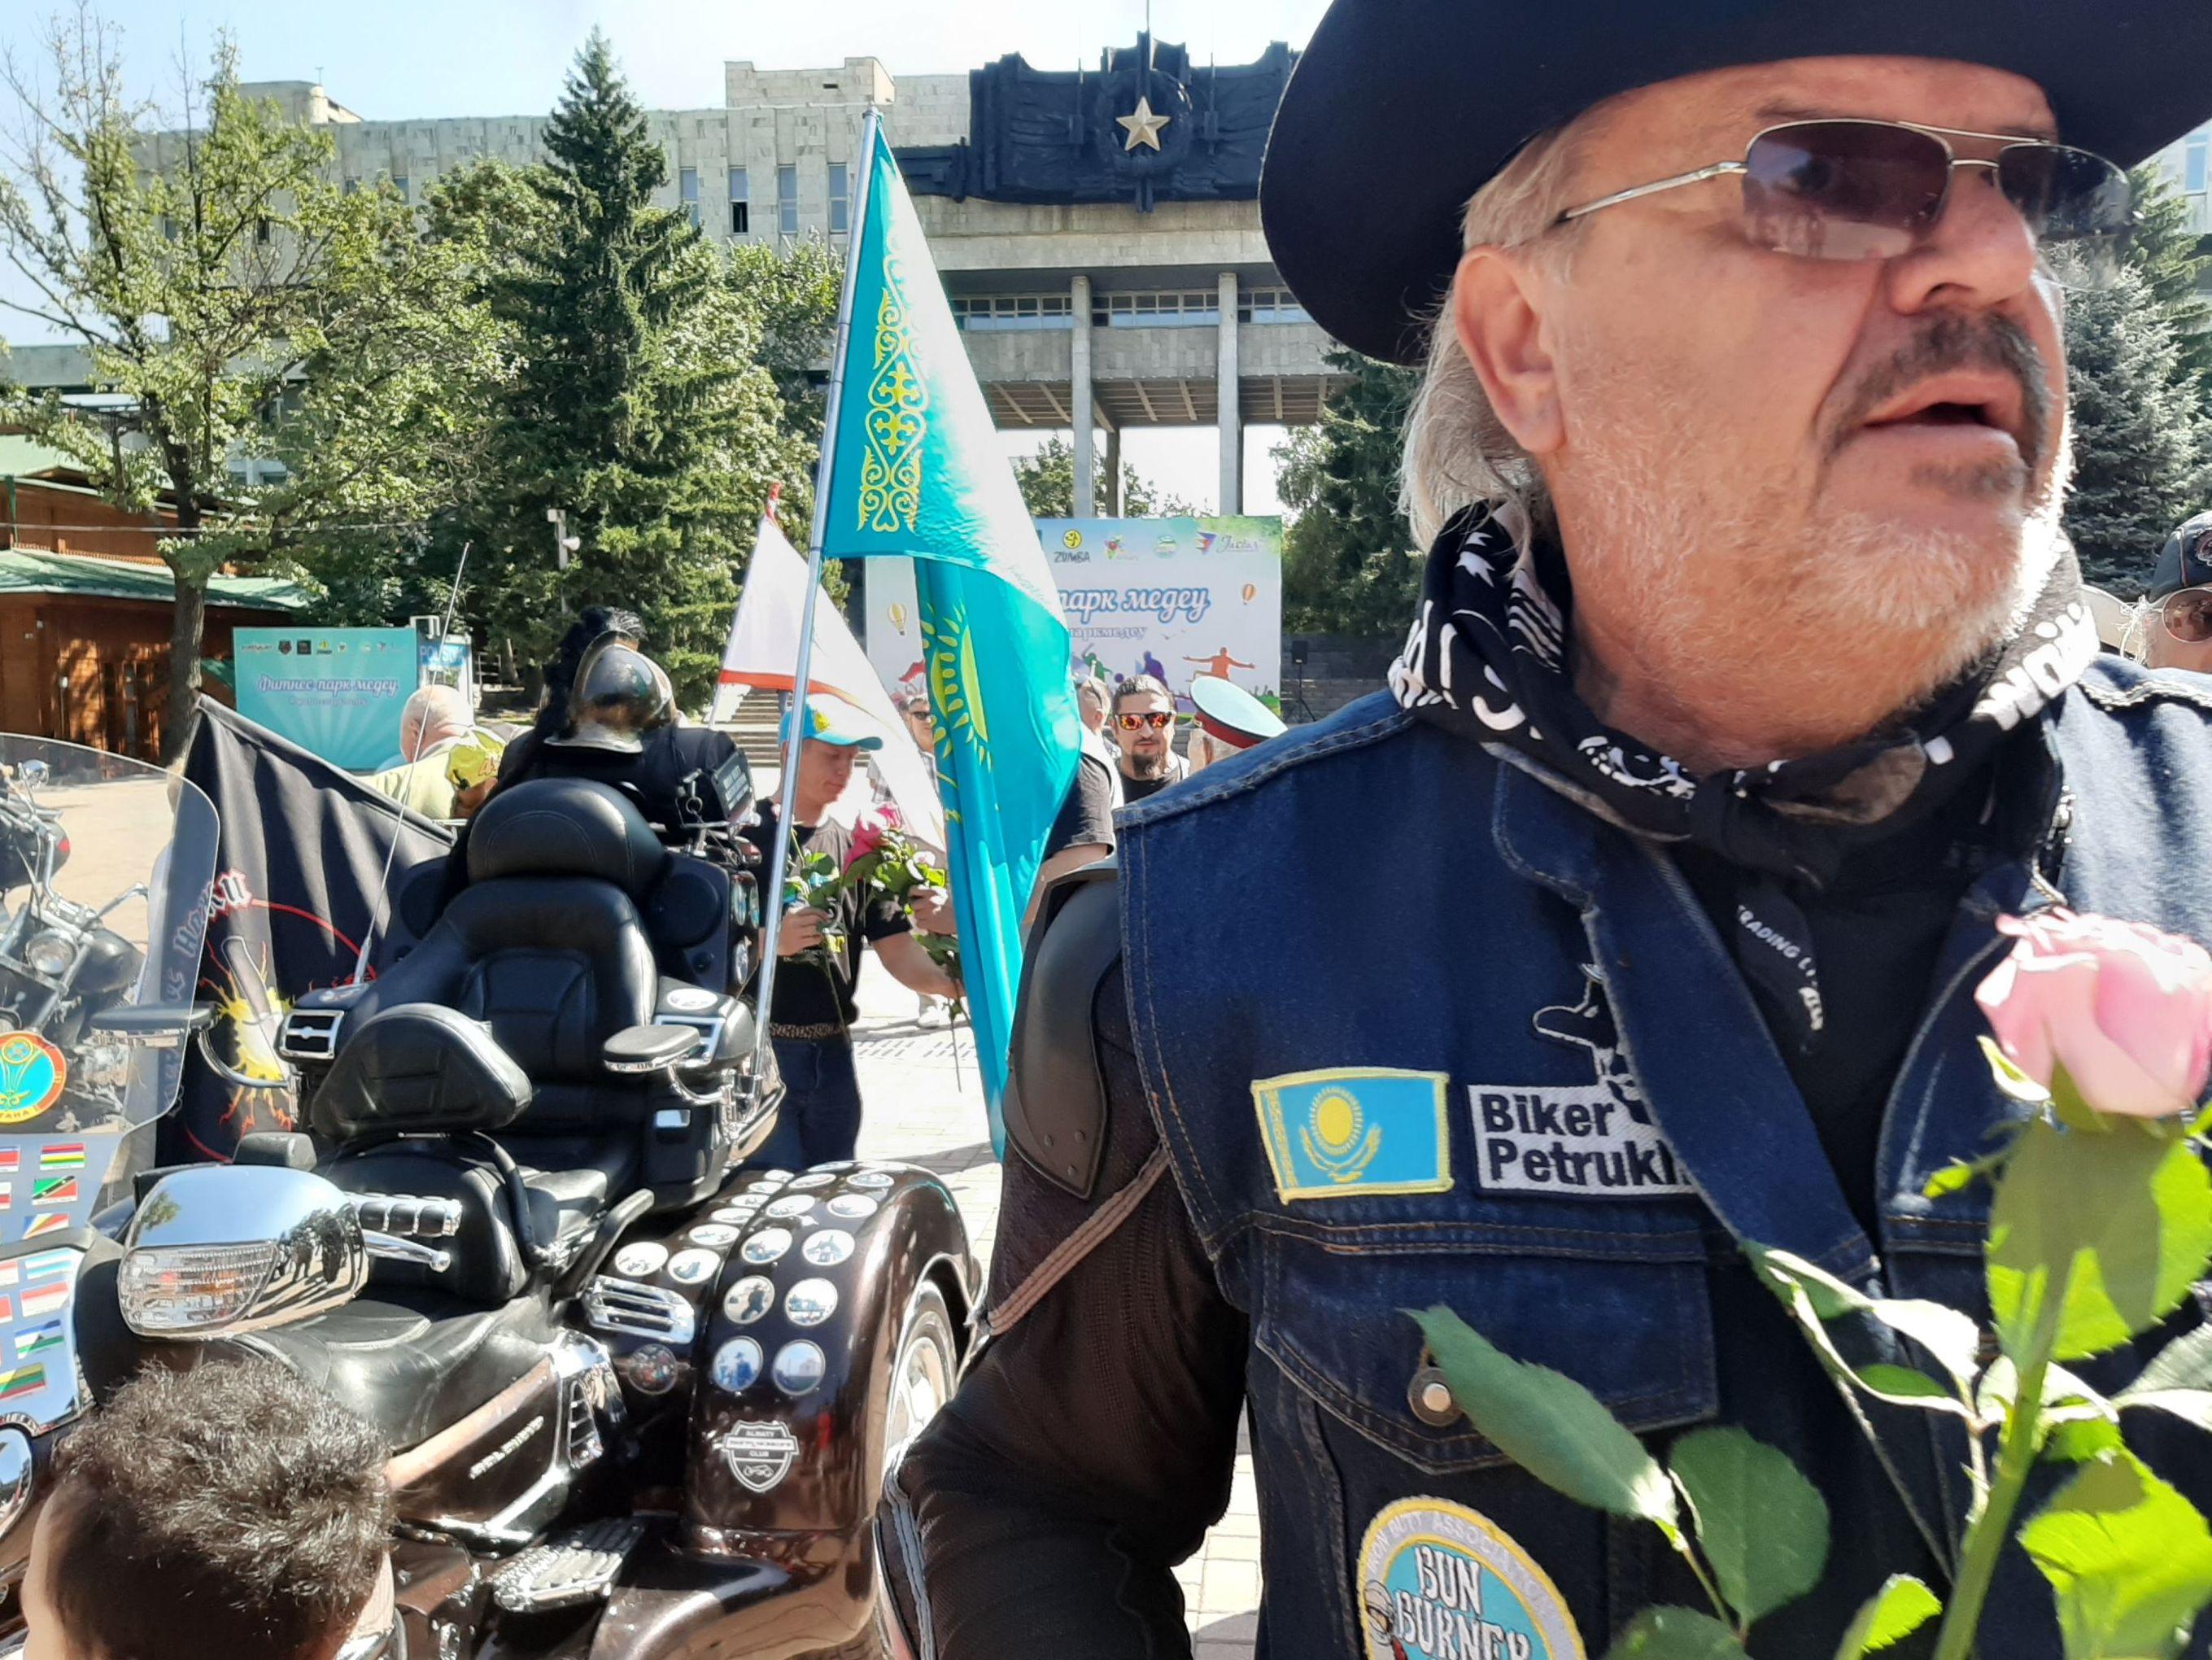 Дмитрий Петрухин - казахстанский байкер-кругосветник